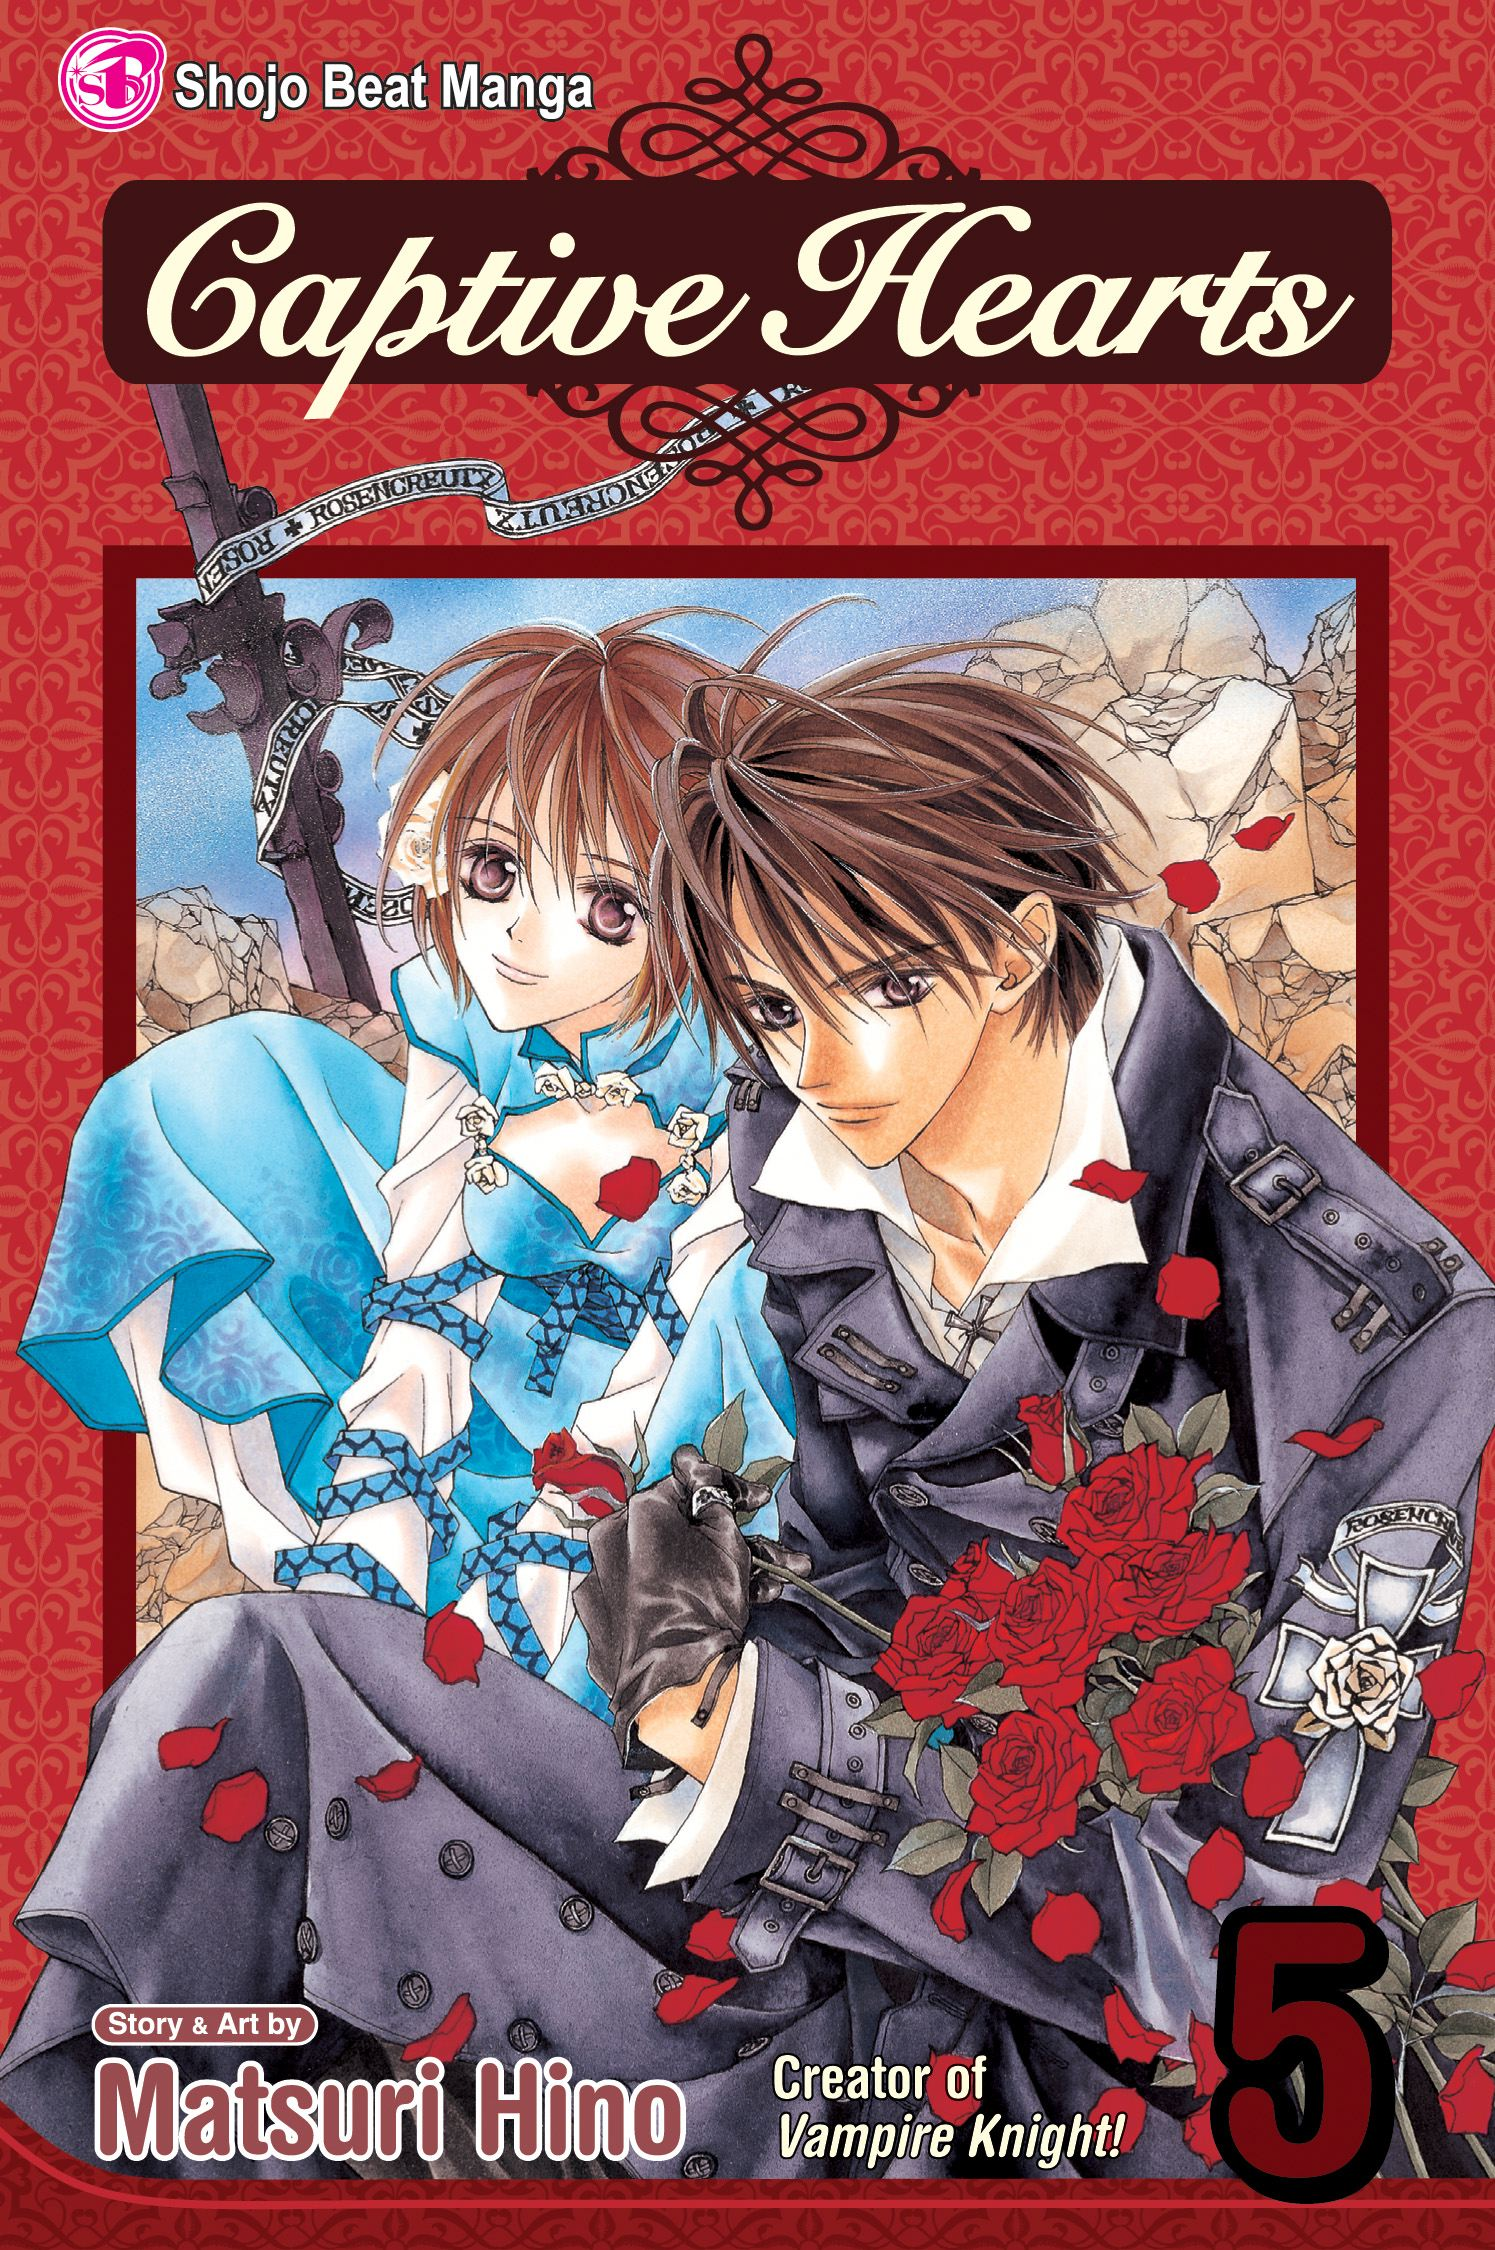 Book Cover Image (jpg): Captive Hearts, Vol. 5